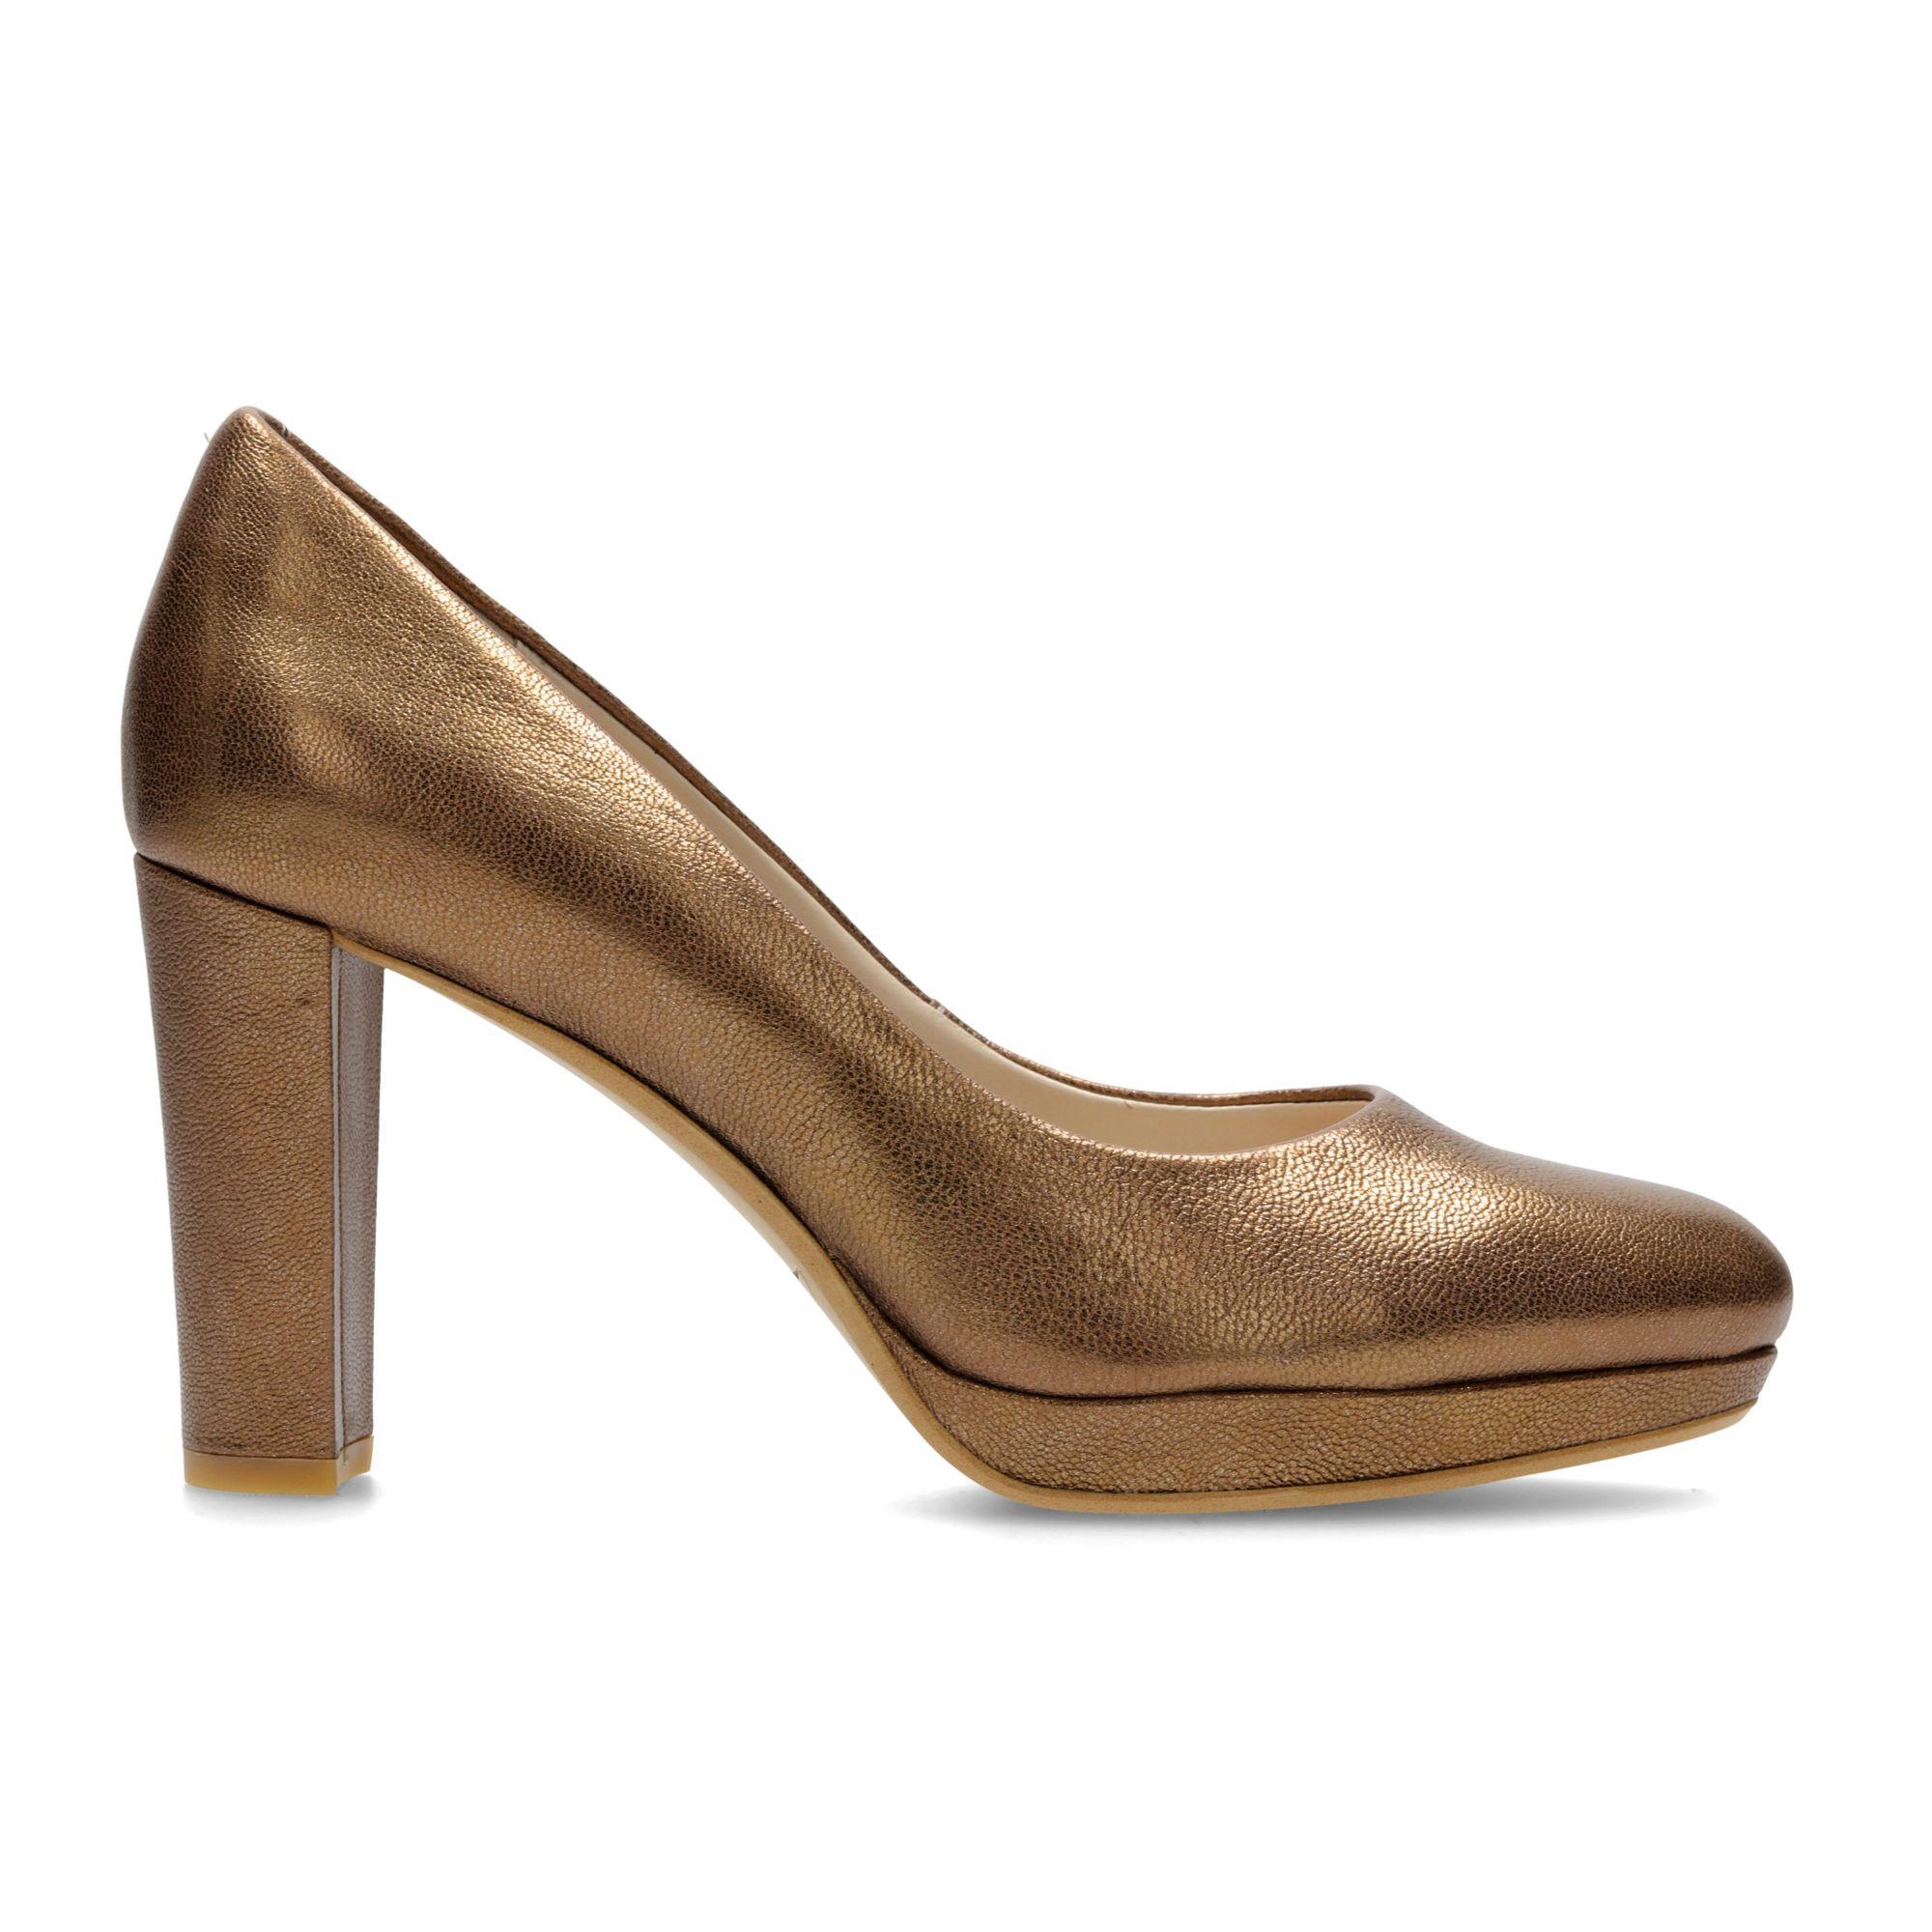 Zapatos mujer Kendra Sienna: Tiendas Notizalia